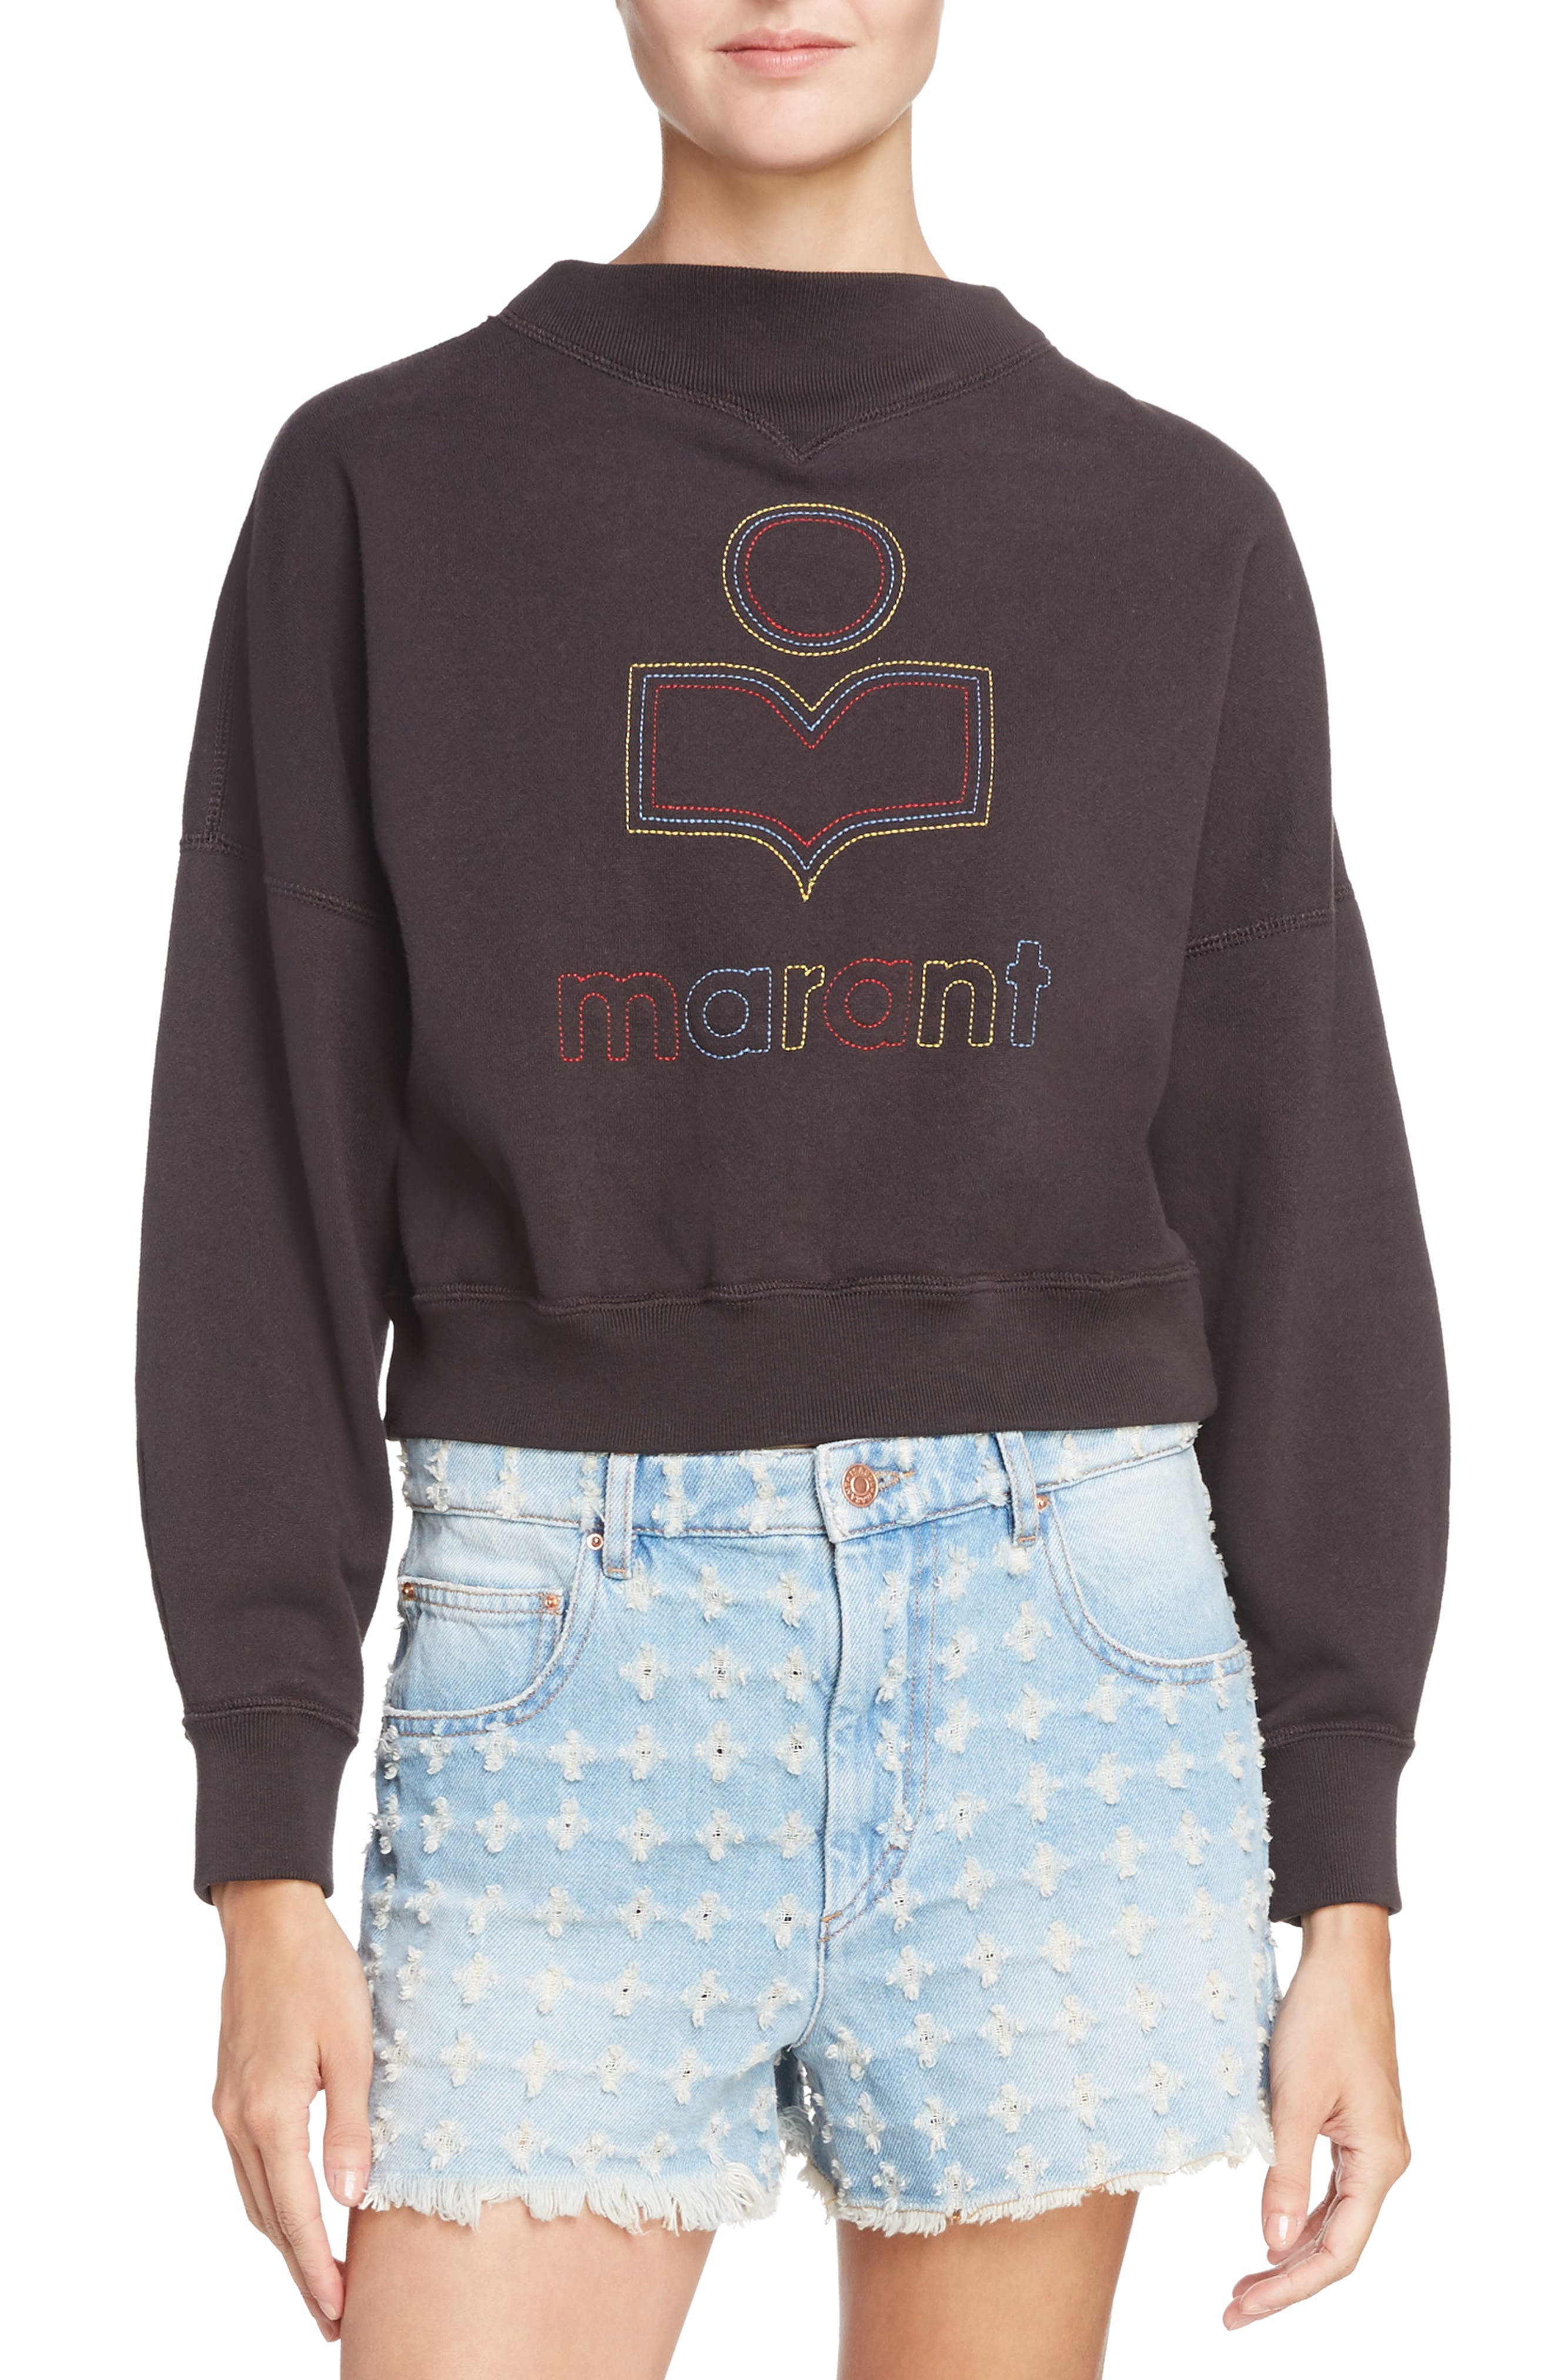 Odilon Sweatshirt,                             Main thumbnail 1, color,                             001